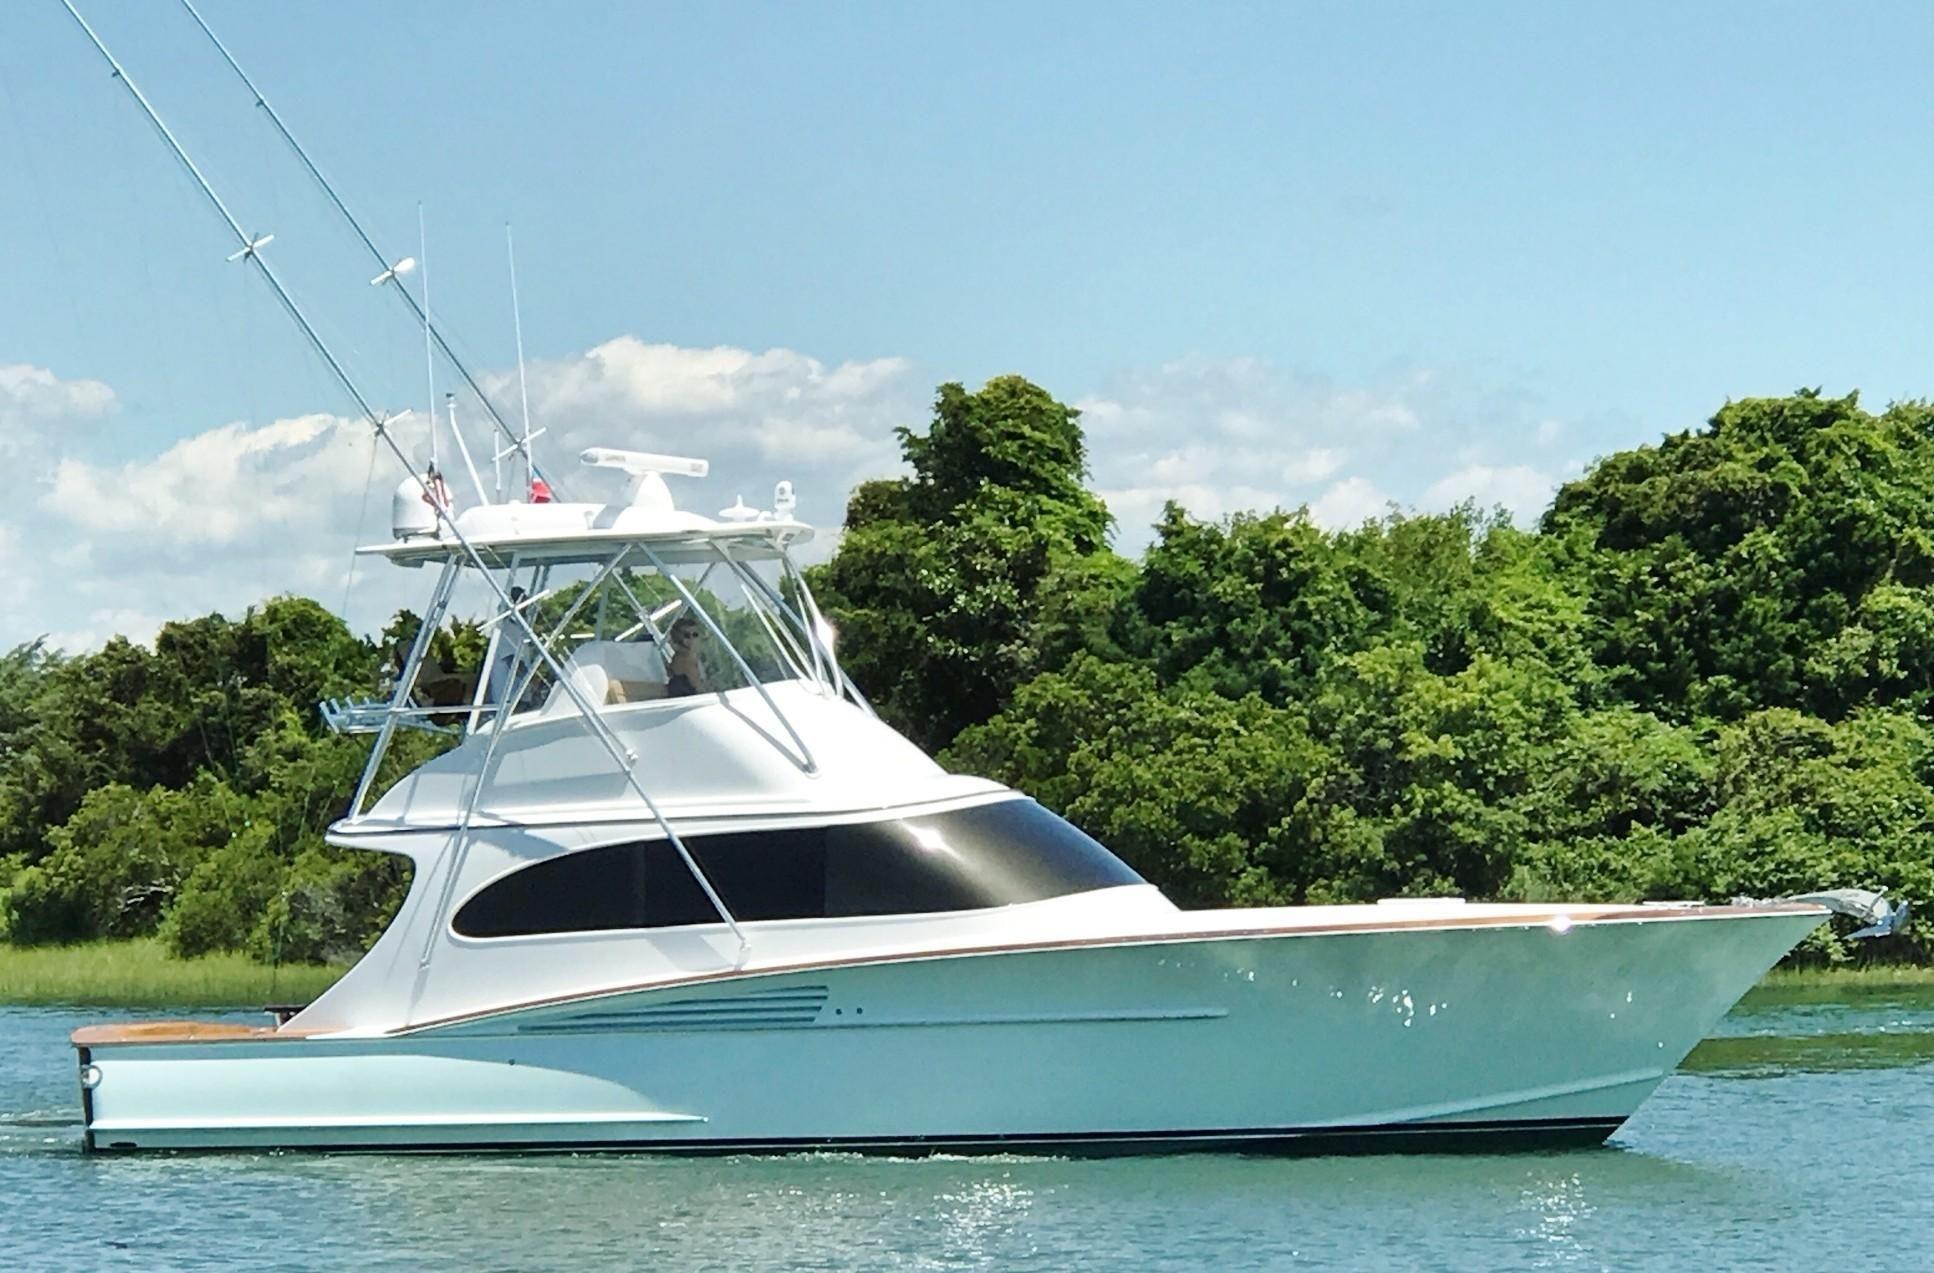 2016 Winter Custom Yachts Sportfish Power boat for sale